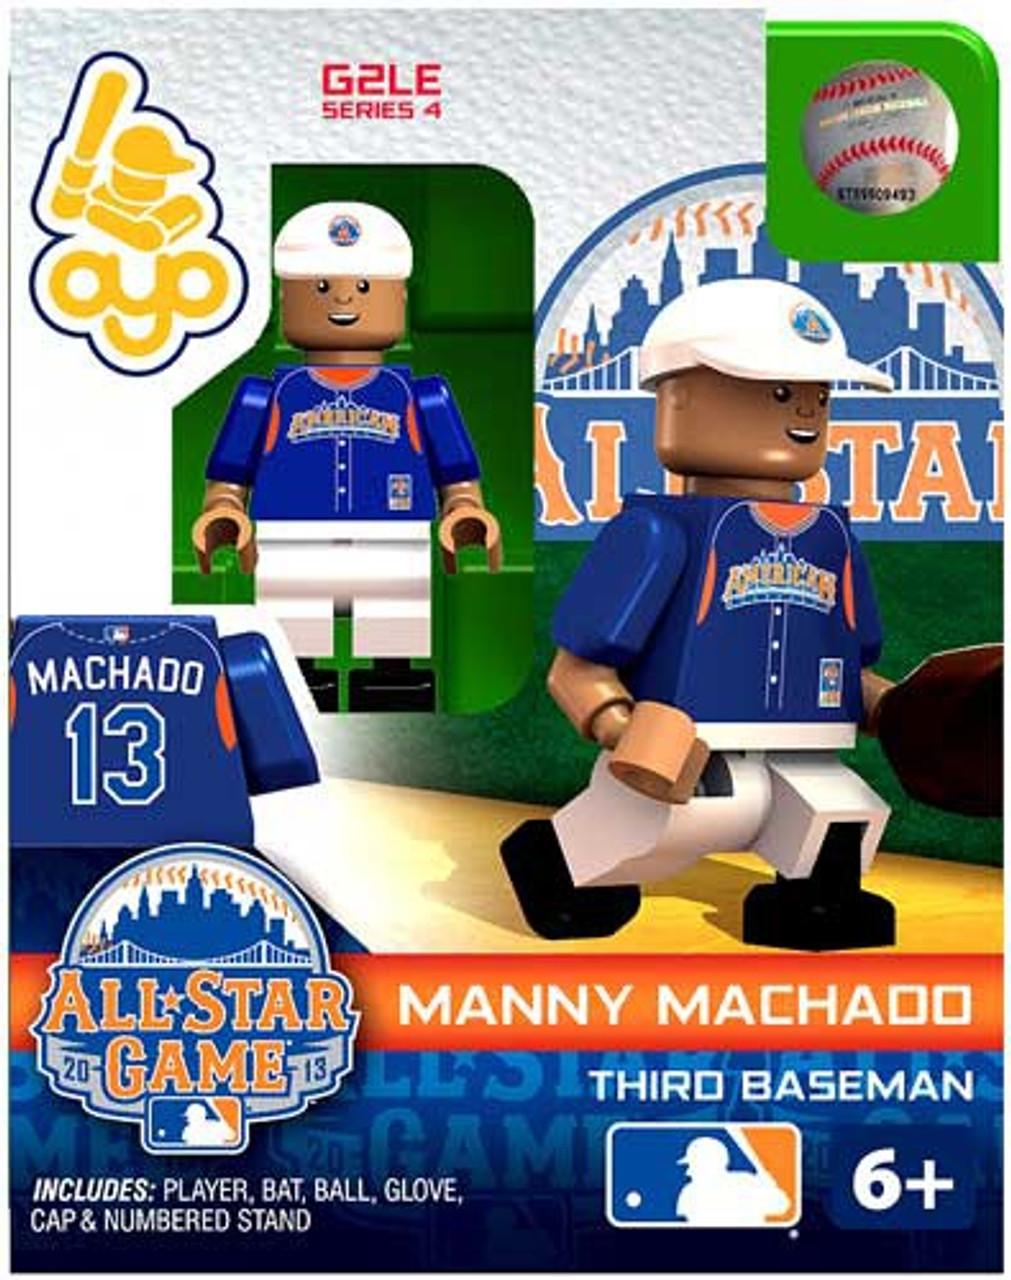 American League MLB Generation 2 Series 4 Manny Machado Minifigure [All-Star Game]